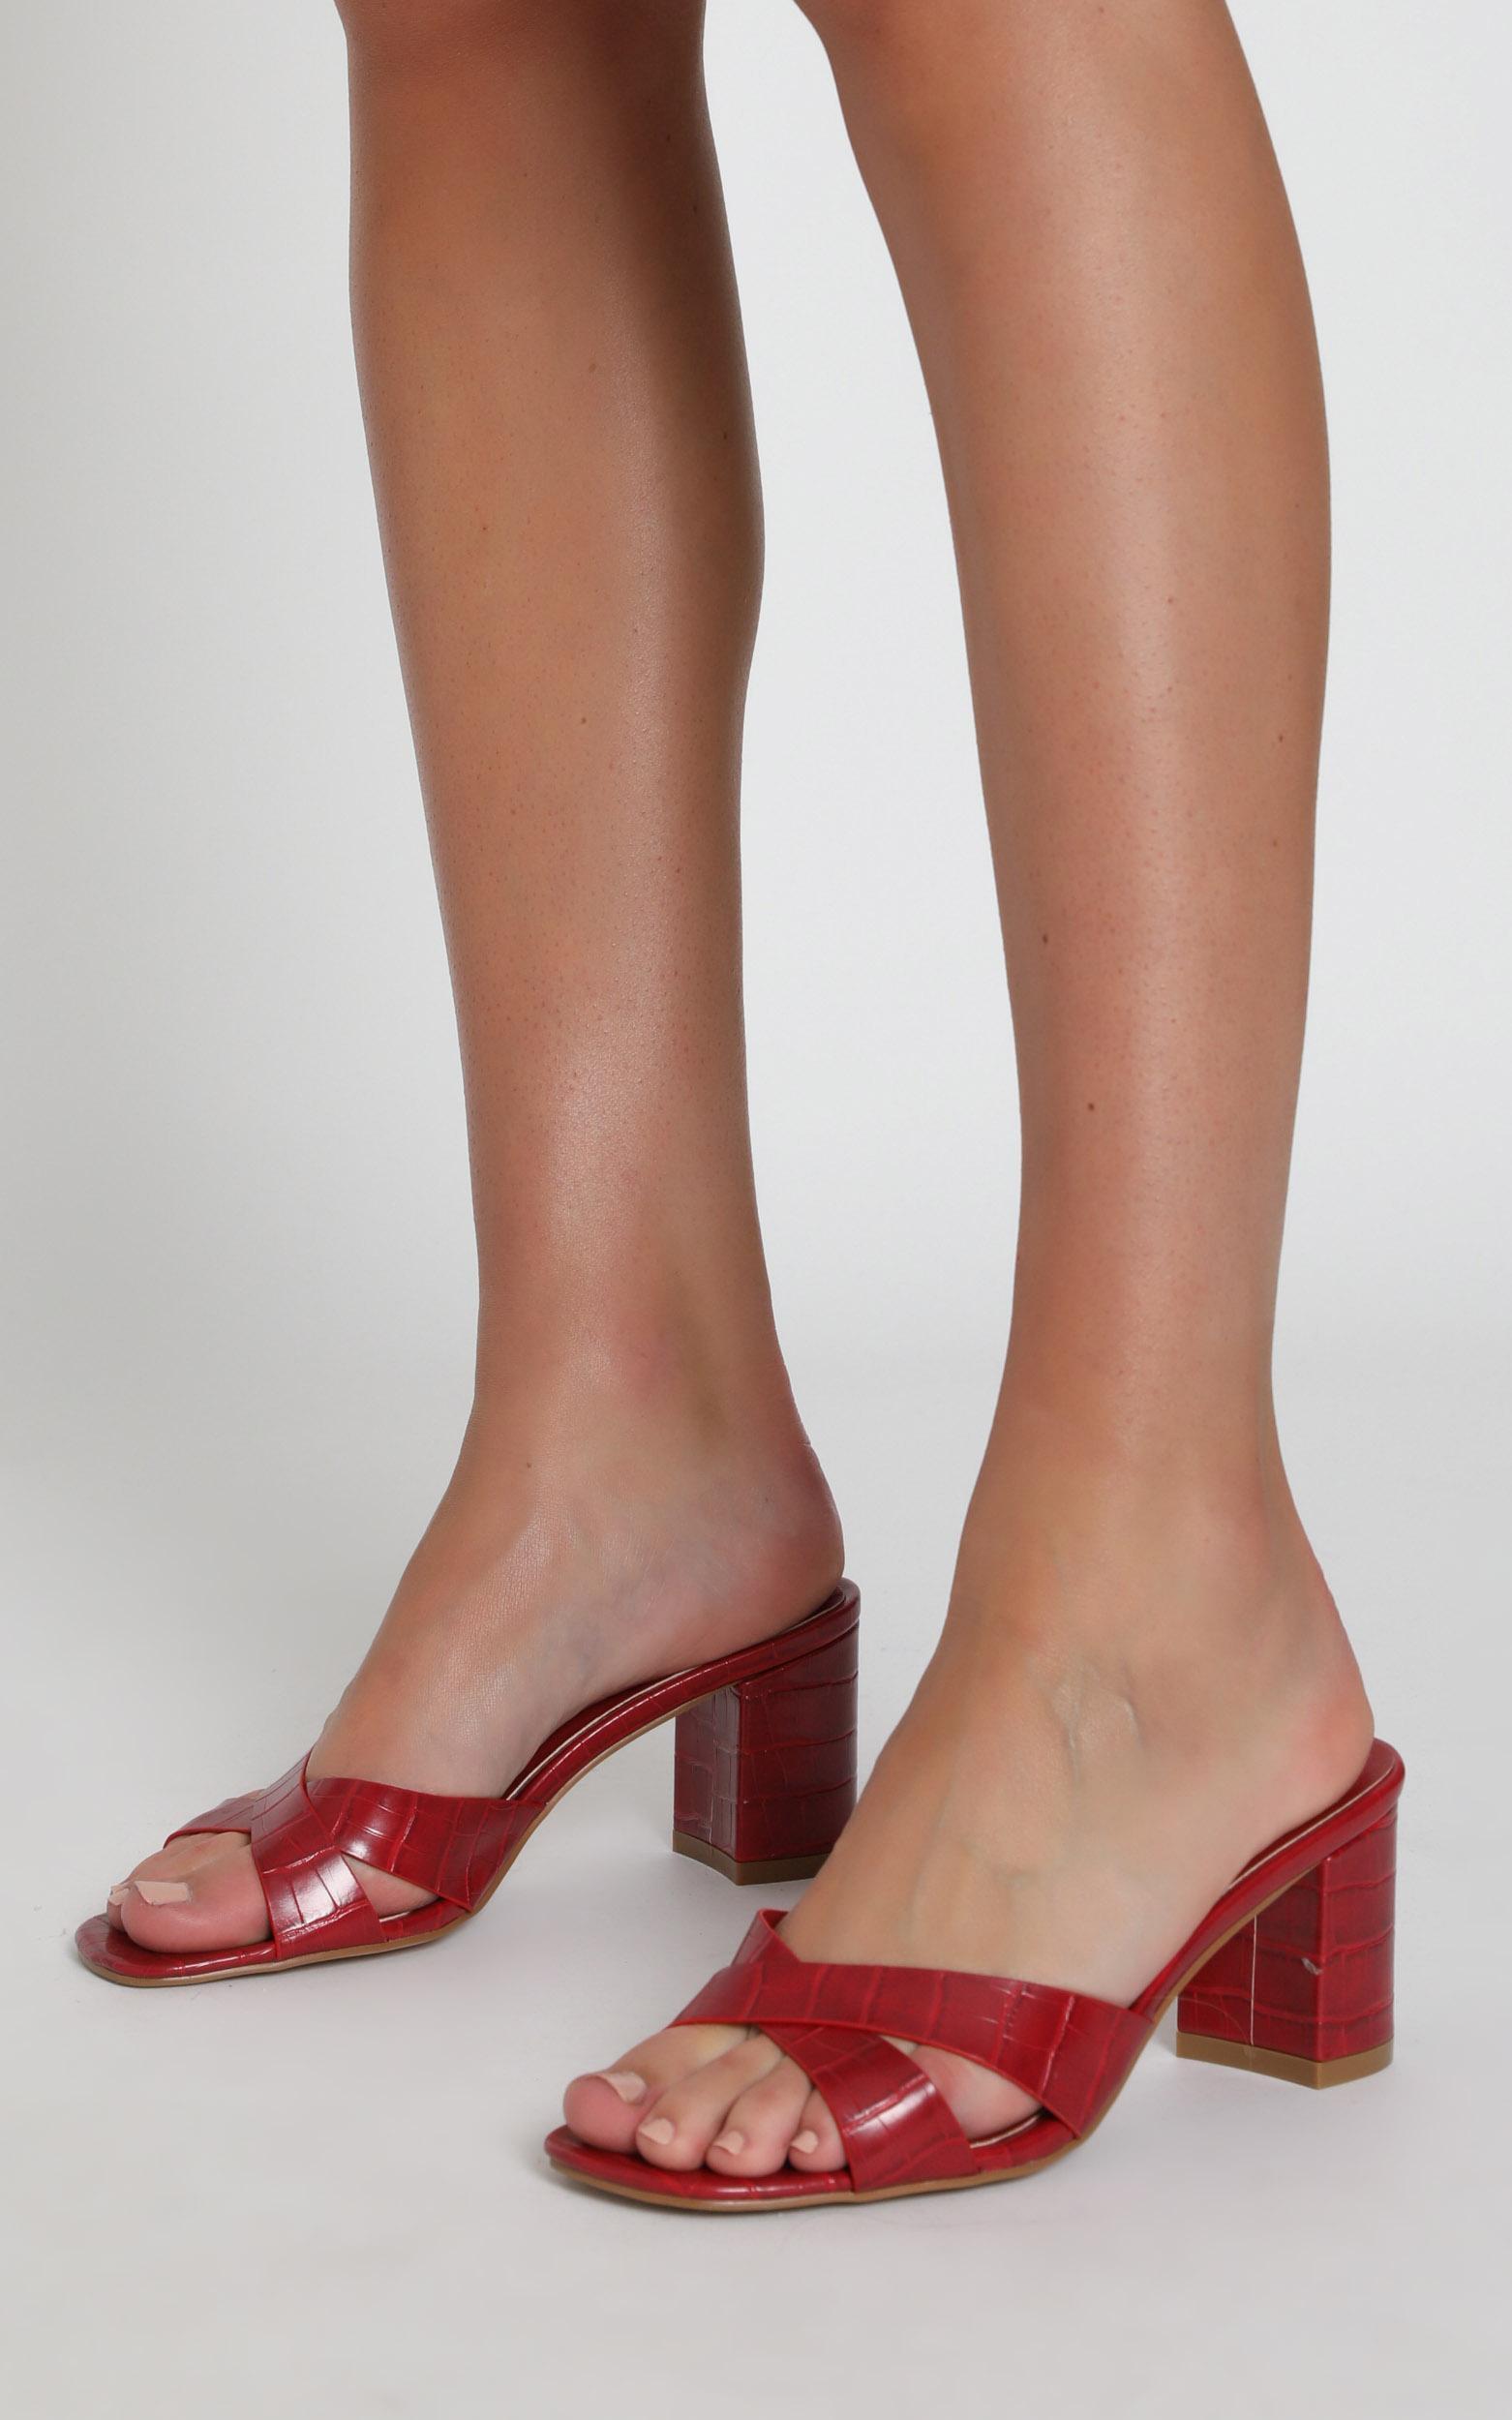 Billini - Yowie heels in red croc - 5, Red, hi-res image number null